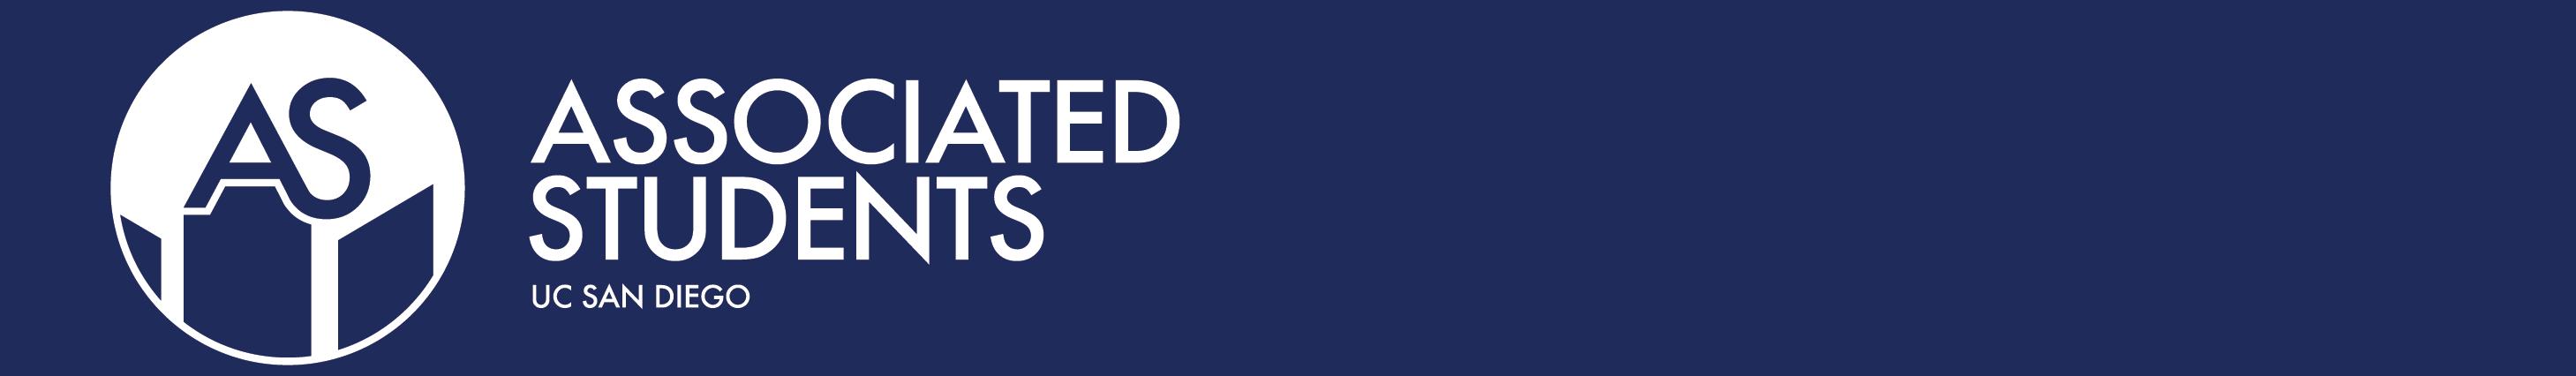 2022 2023 Ucsd Calendar.As One University Of California San Diego